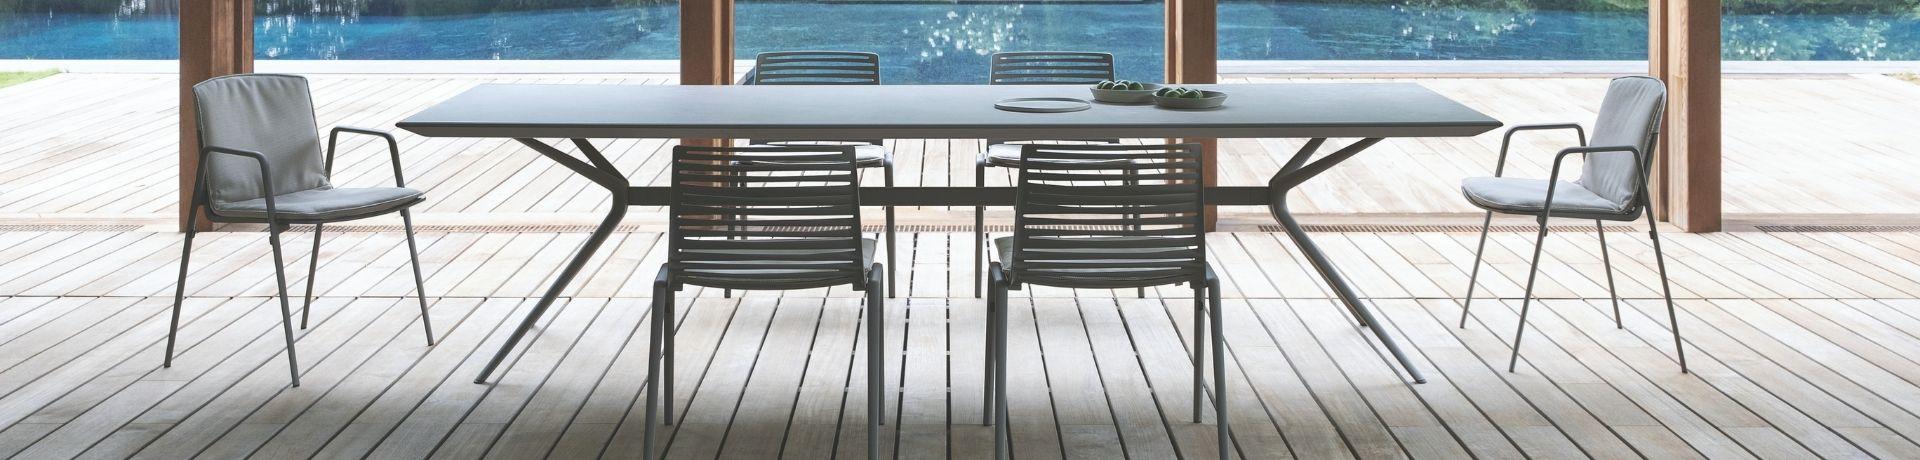 tuintafels tuintafel unieke tuintafels design tuintafels outdoor meubelen